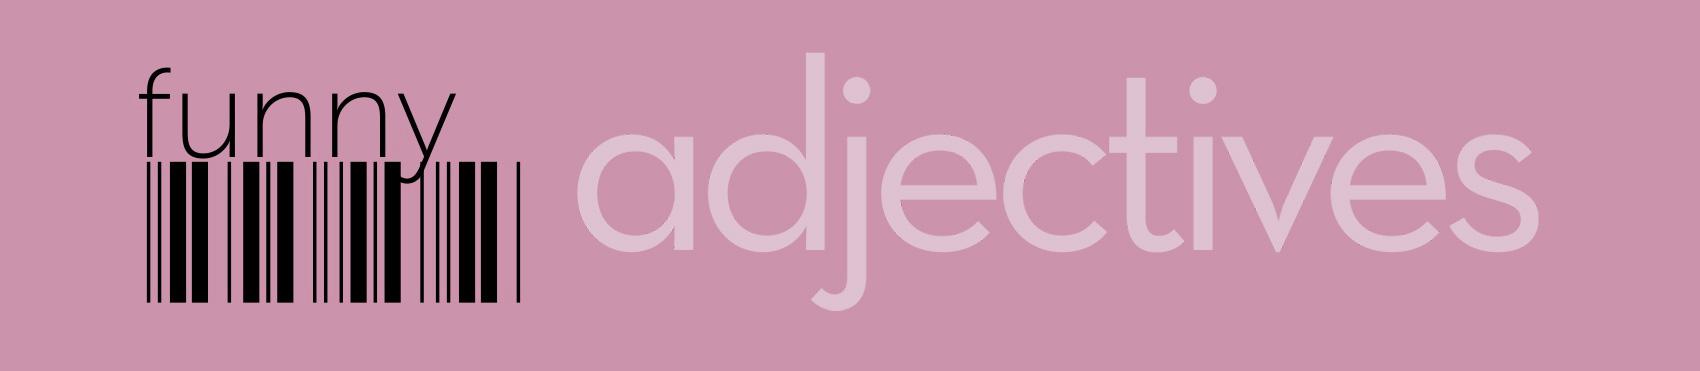 Adjectives logo ideas